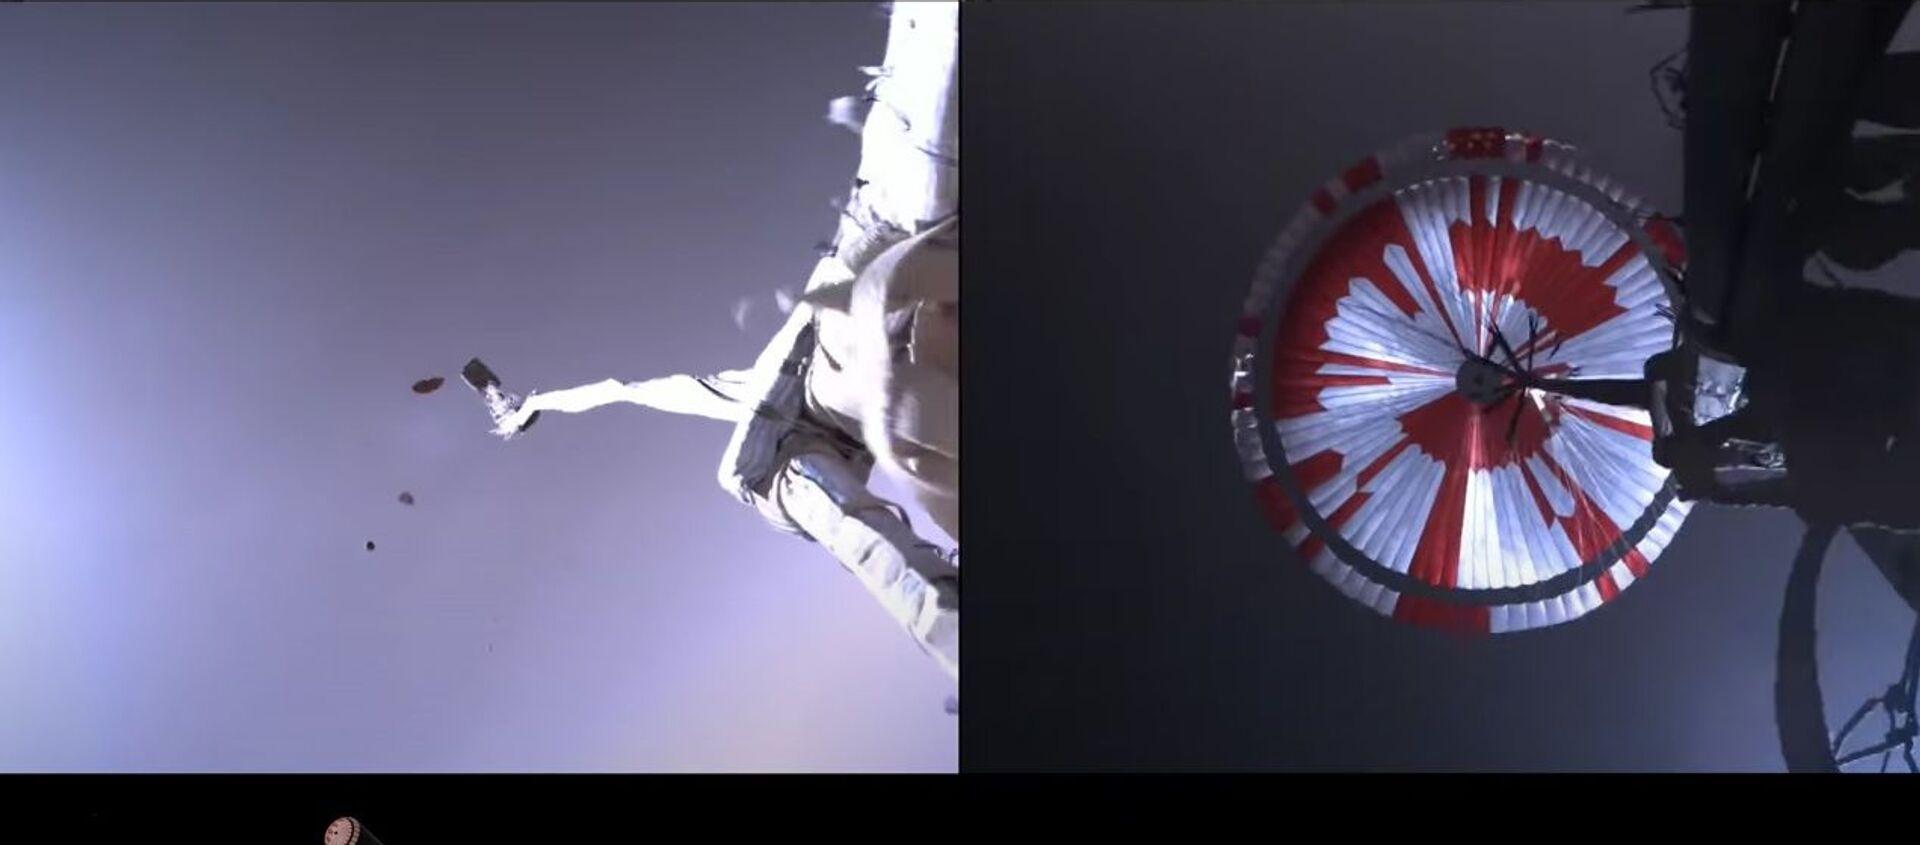 NASA опубликовало видео посадки ровера Perseverance на Марс - Sputnik Таджикистан, 1920, 23.02.2021